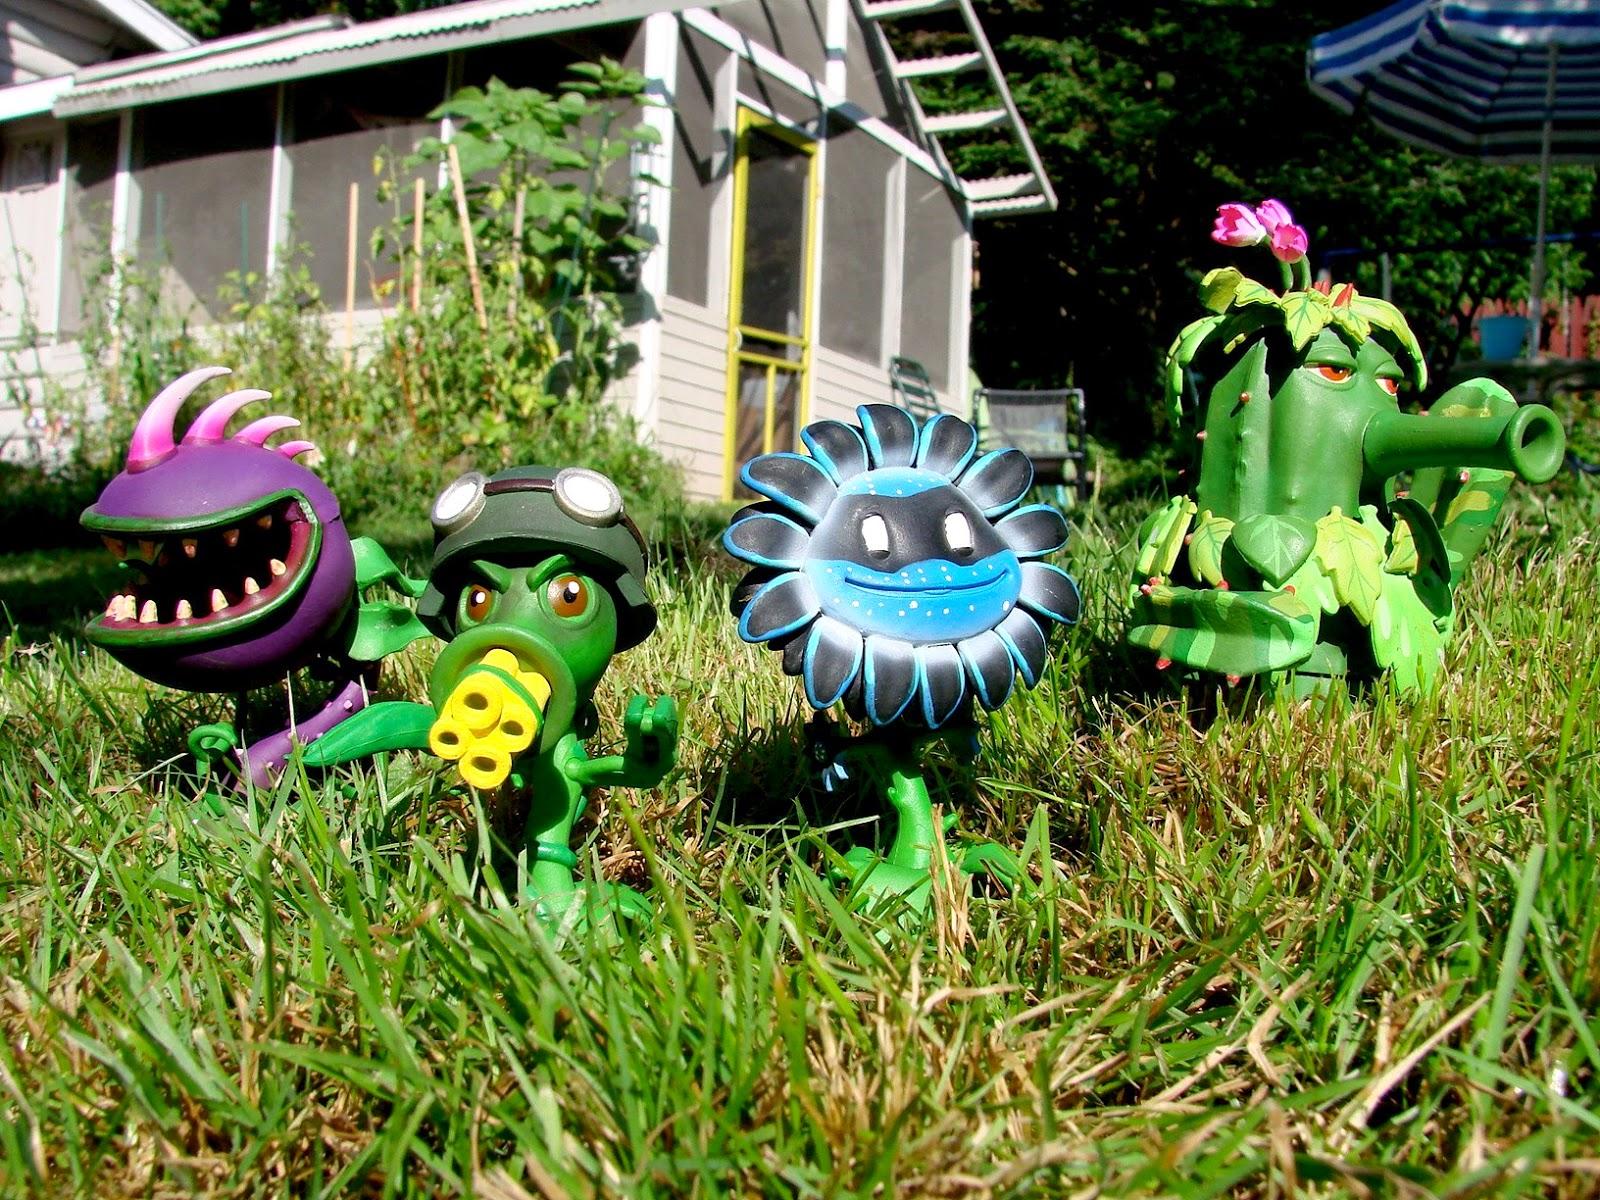 Collecting toyz diamond select toys popcap to launch - Plants vs zombies garden warfare toys ...